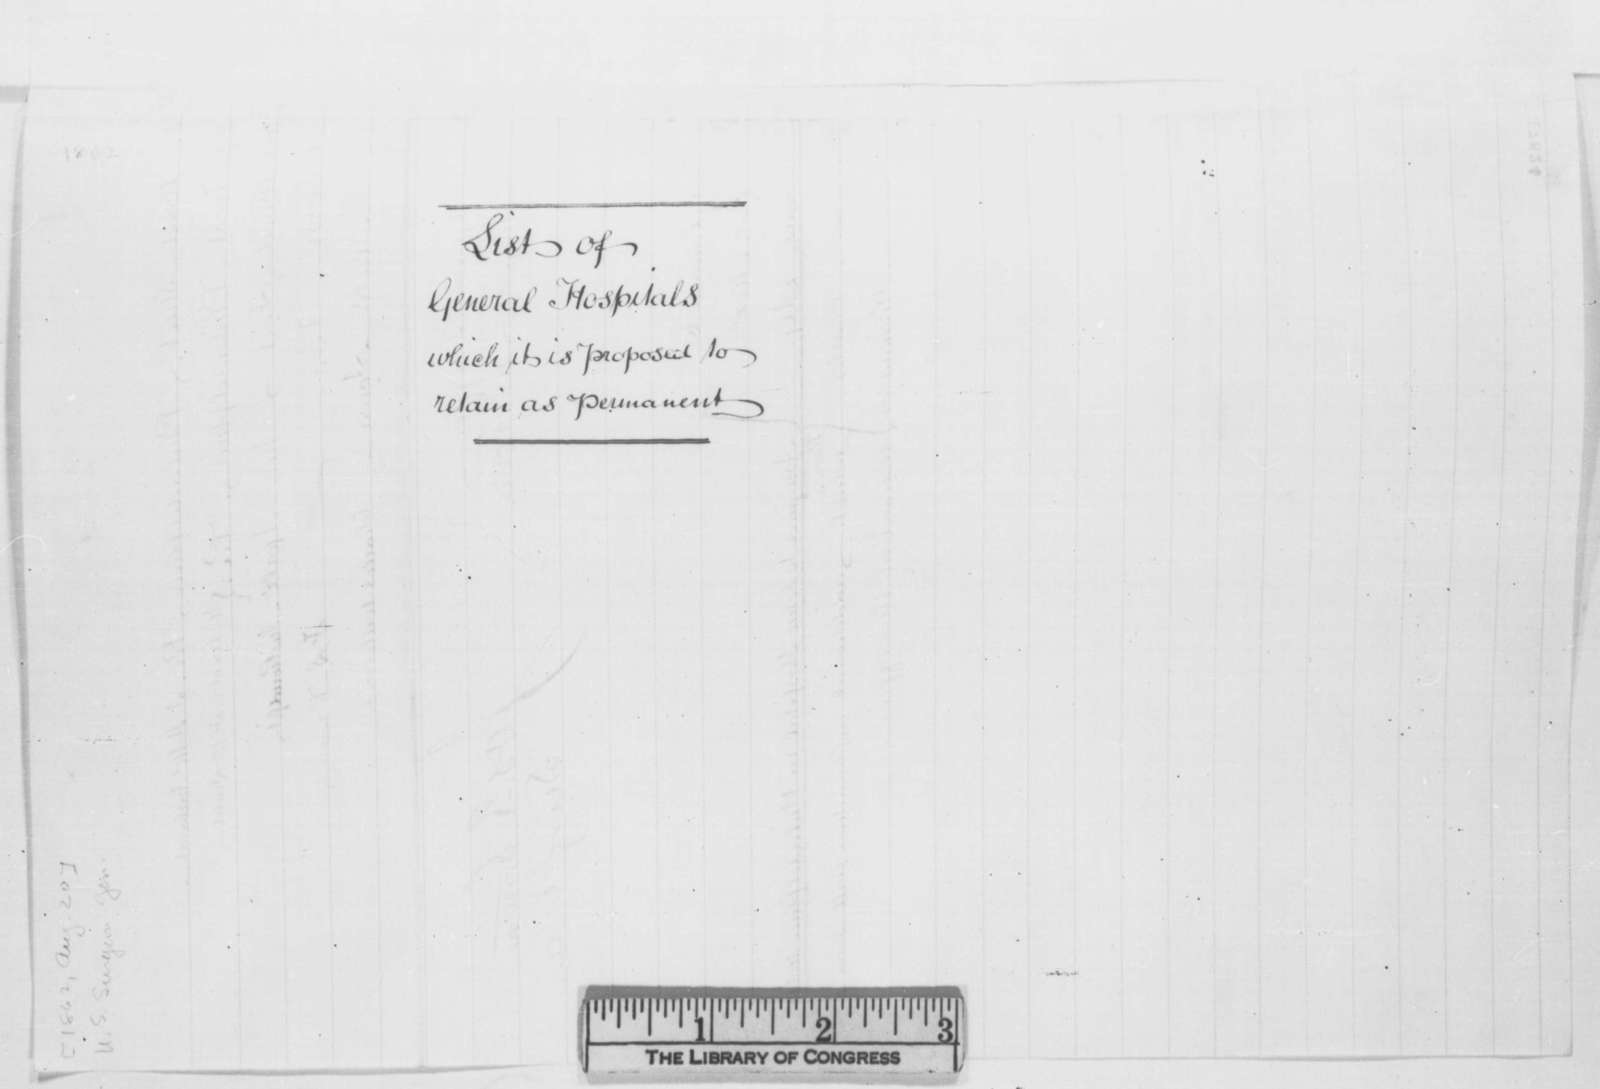 Joseph R. Smith to John Hay, Wednesday, August 20, 1862  (Sends list of hospitals)